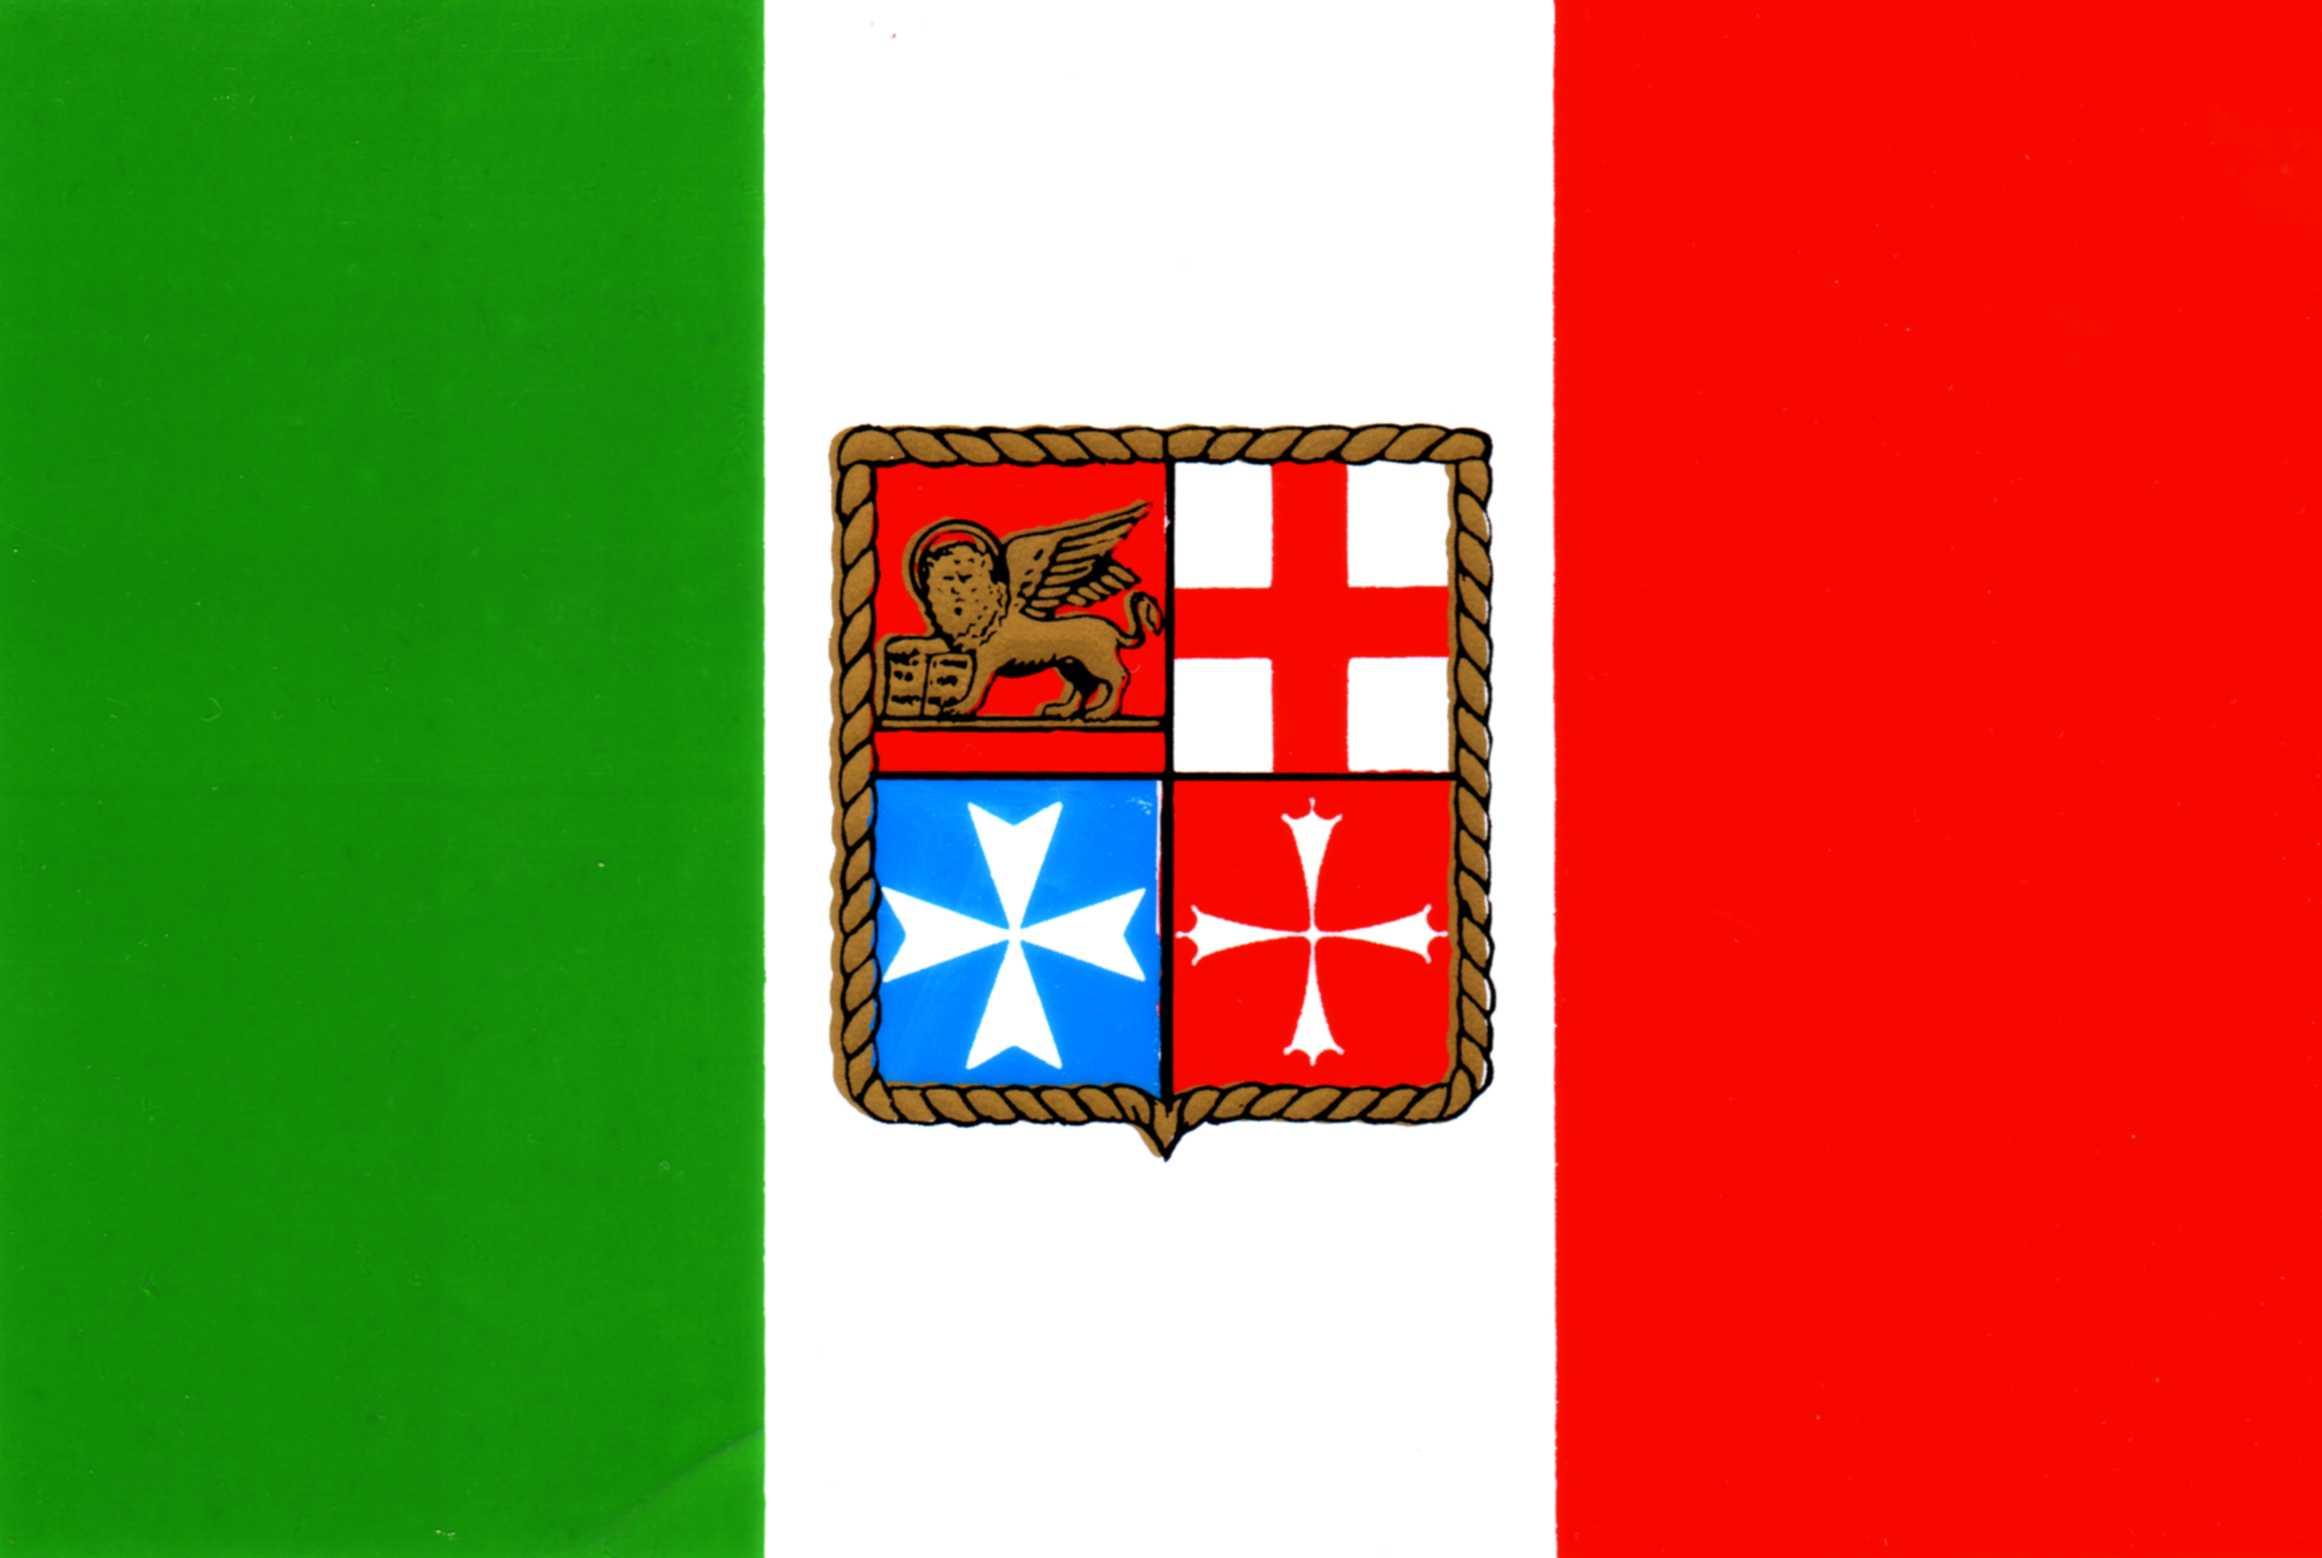 Bandiera navale italiana